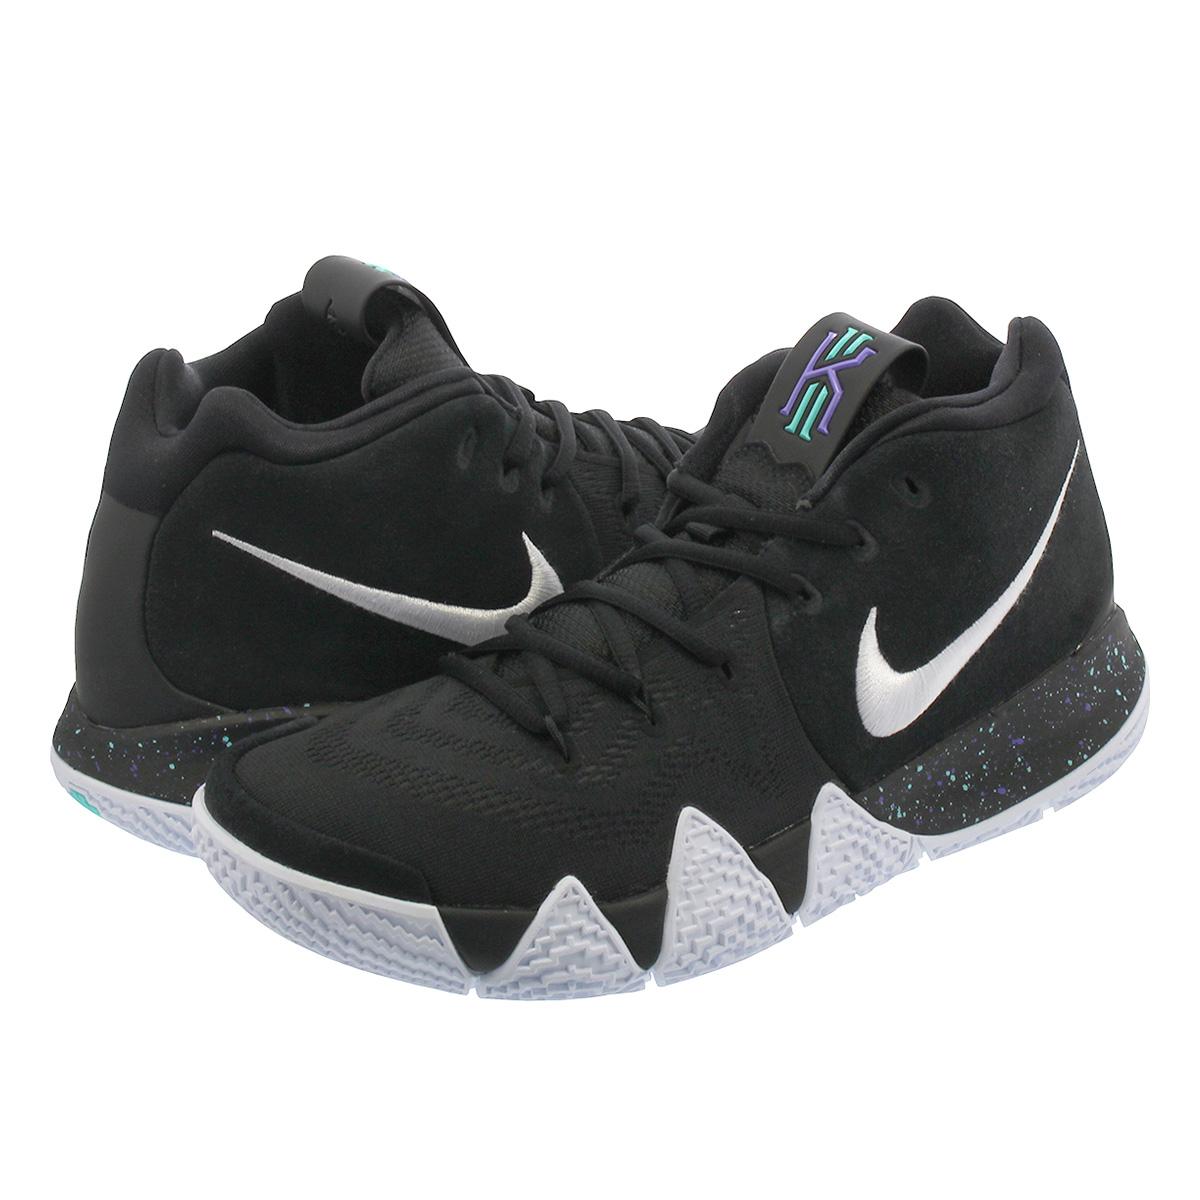 85c70903b48 SELECT SHOP LOWTEX  NIKE KYRIE 4 Nike chi Lee 4 BLACK WHITE 943